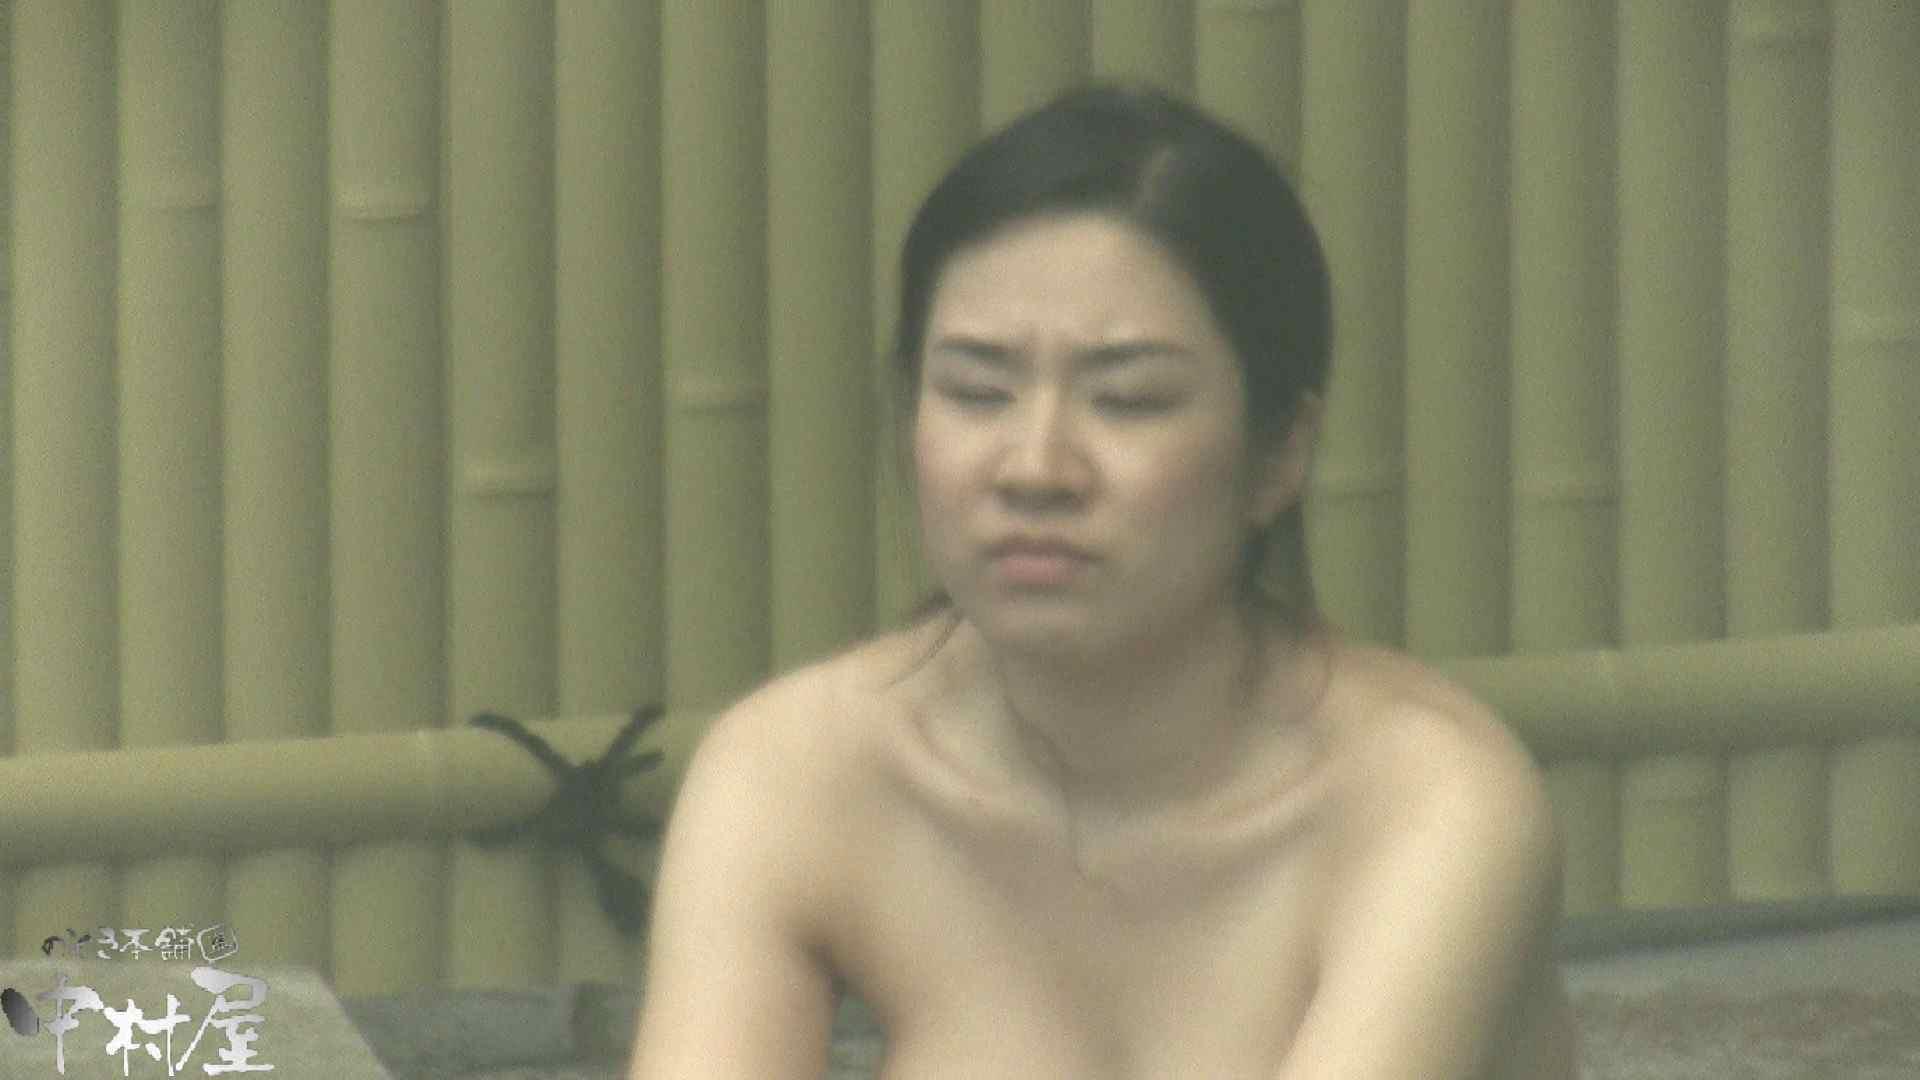 Aquaな露天風呂Vol.913 OLのエロ生活 すけべAV動画紹介 68連発 50